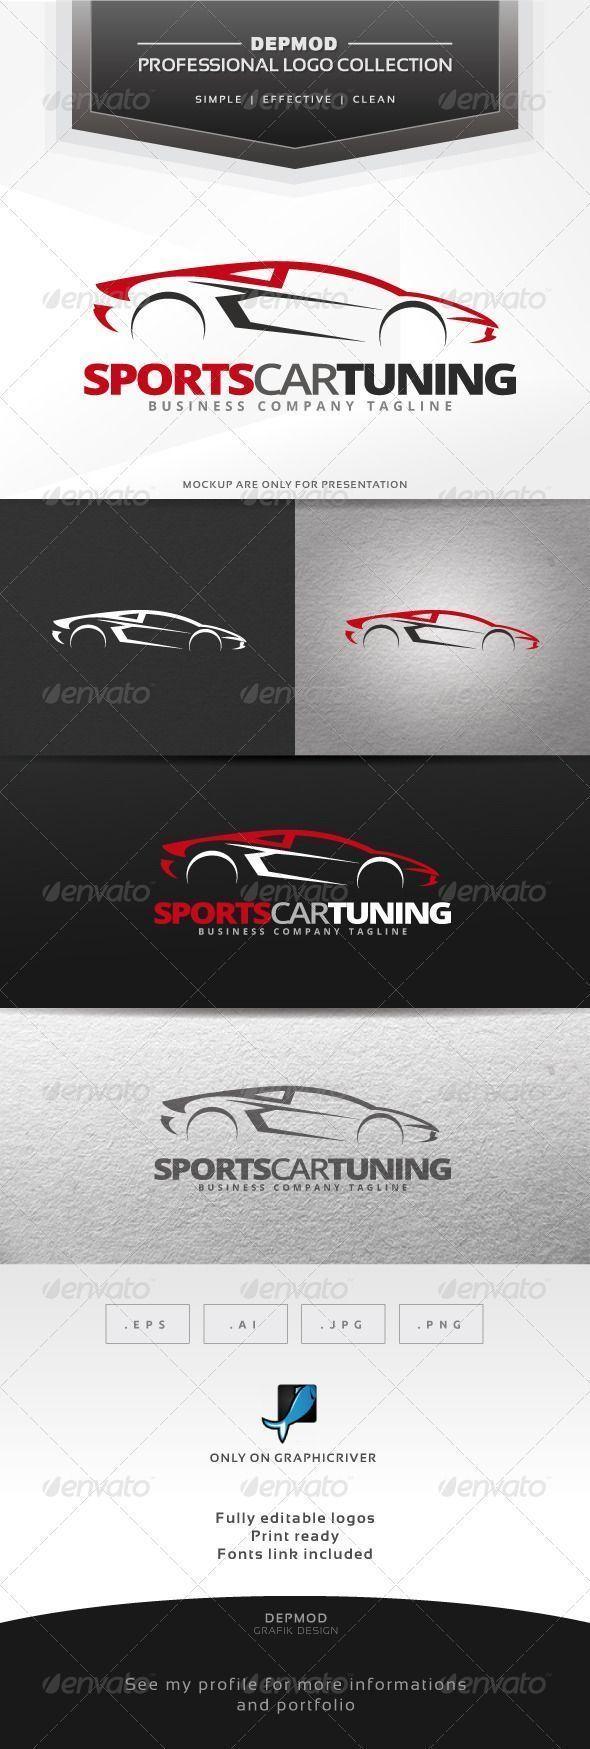 Sports Car Tuning Logo Design Template Vector logotype